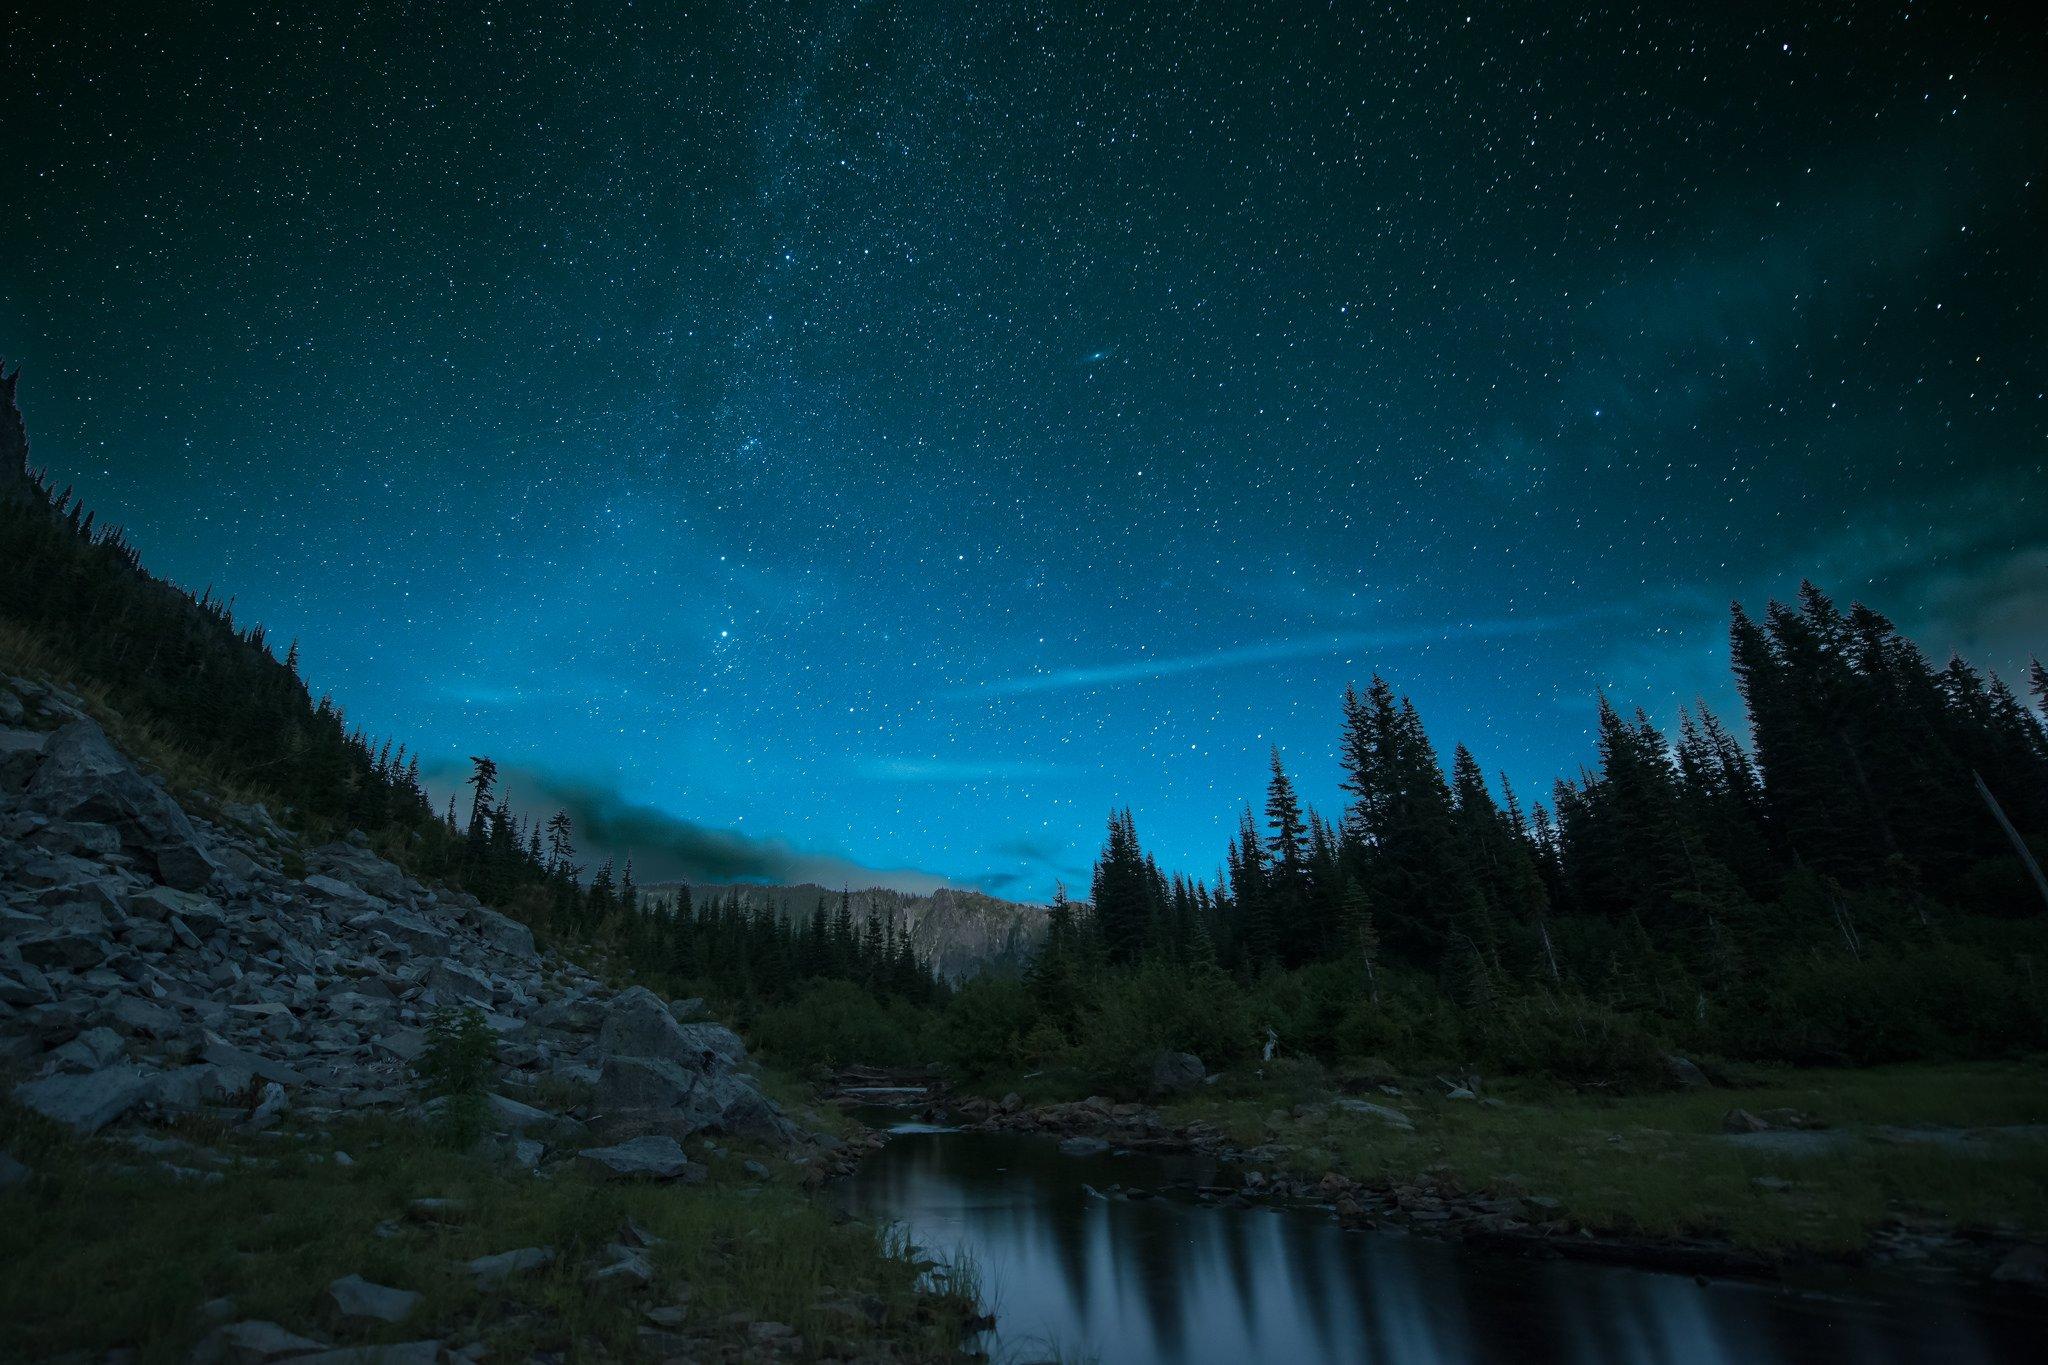 2048x1365 px galaxy milky night rock sky space stars wallpaper 1733679